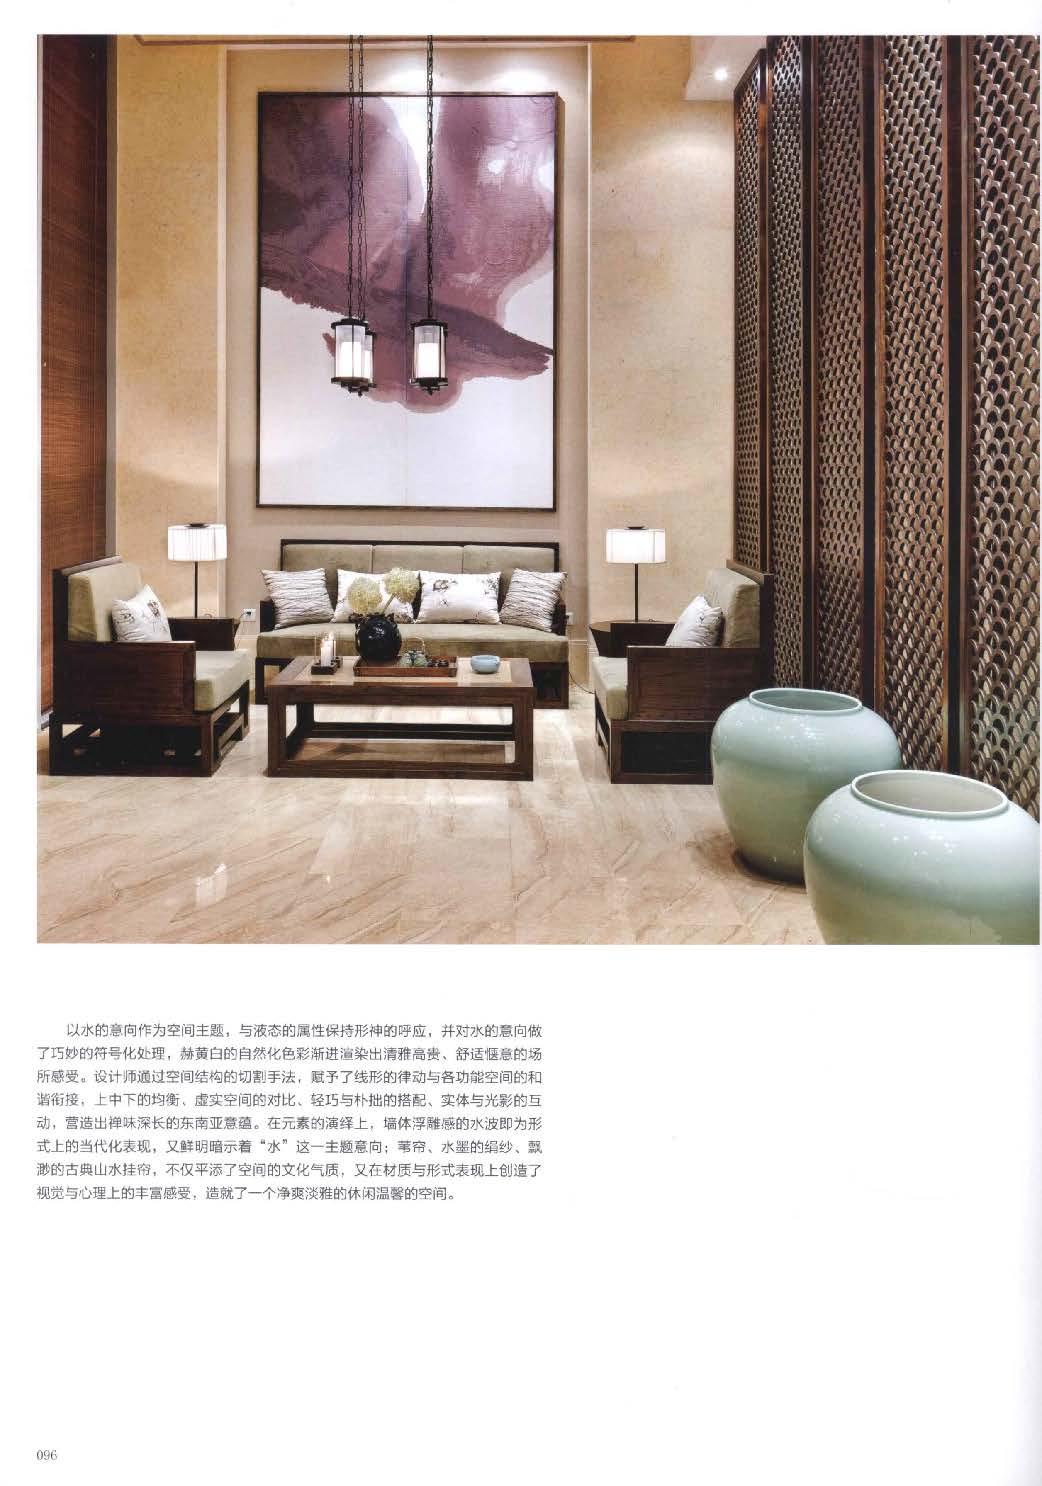 H073 东方风情 会所、餐饮细部解析_Page_094.jpg